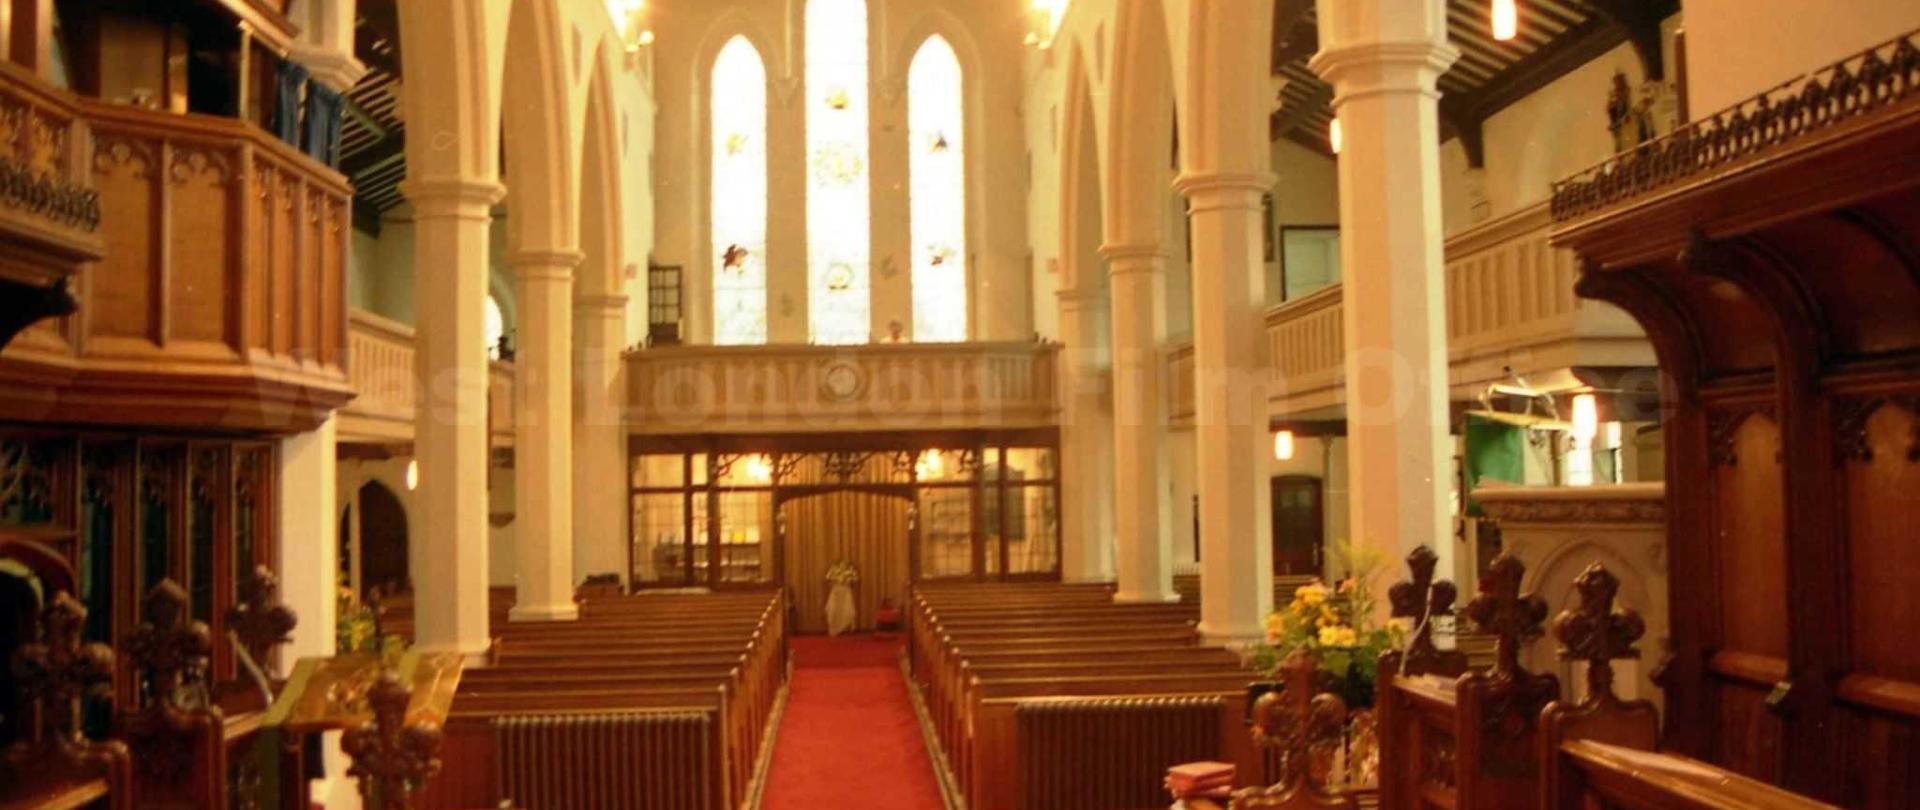 1-church2.jpg